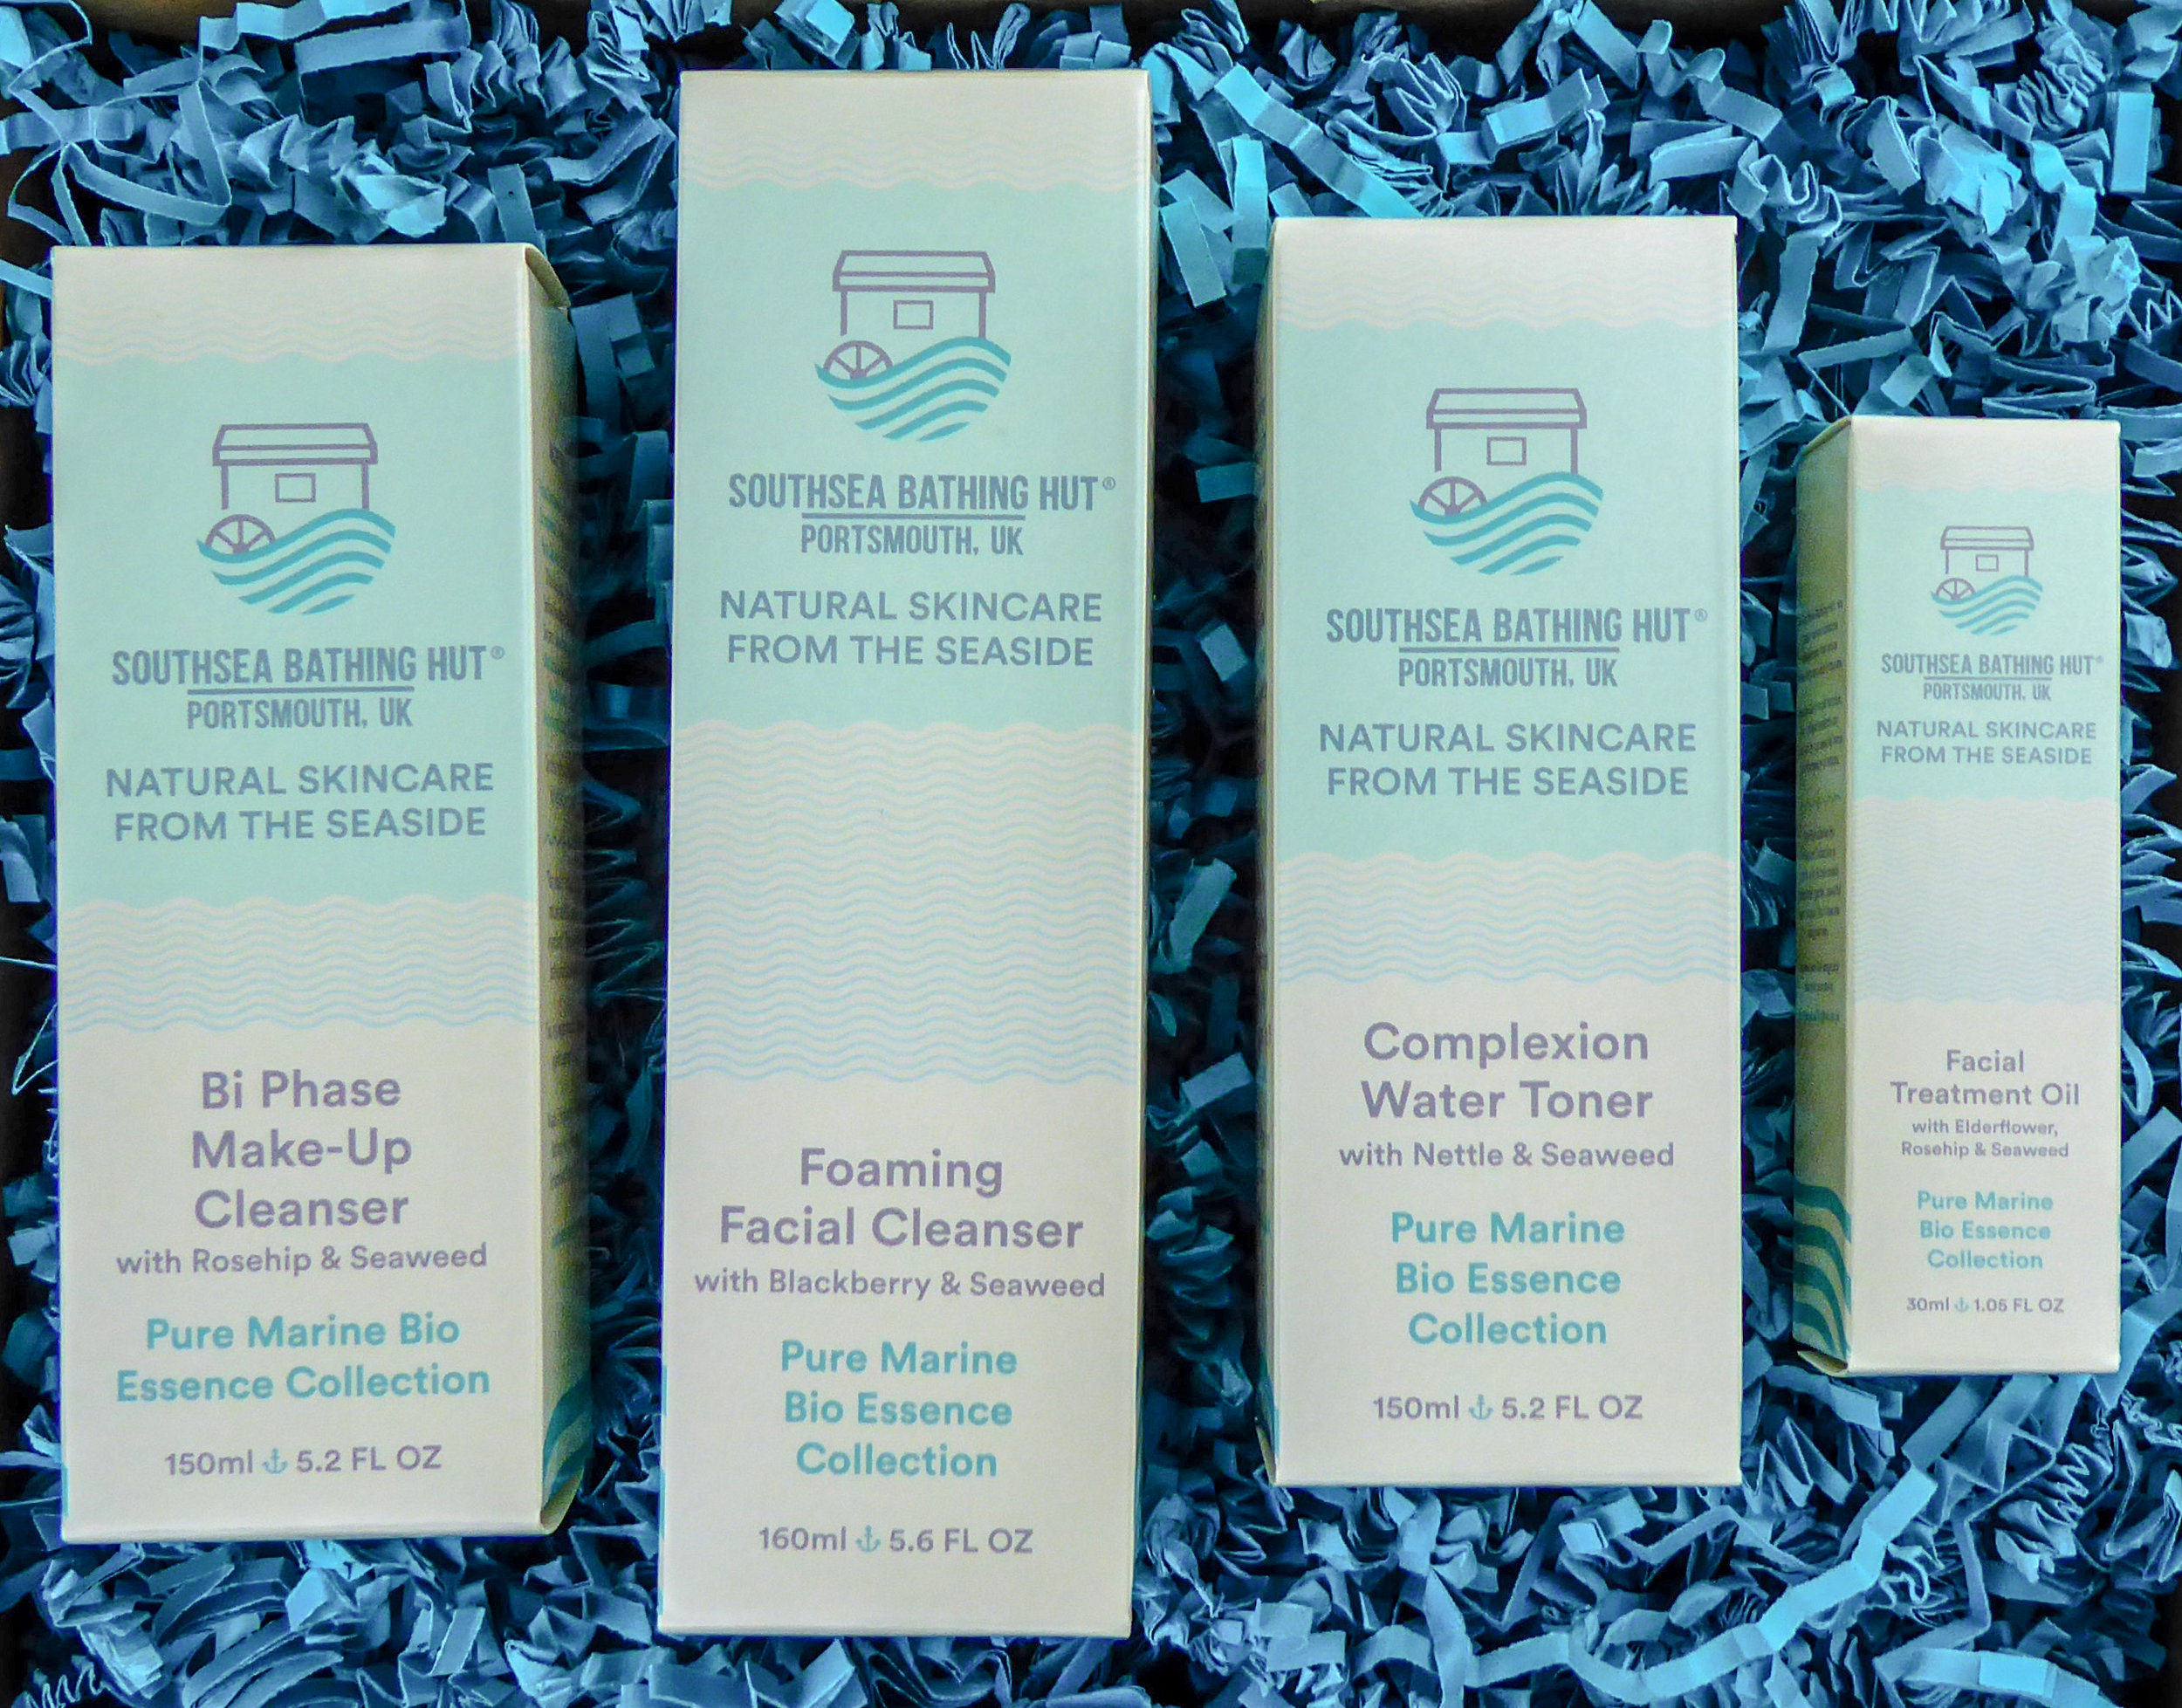 Southsea Bathing Hut launch new organic product range